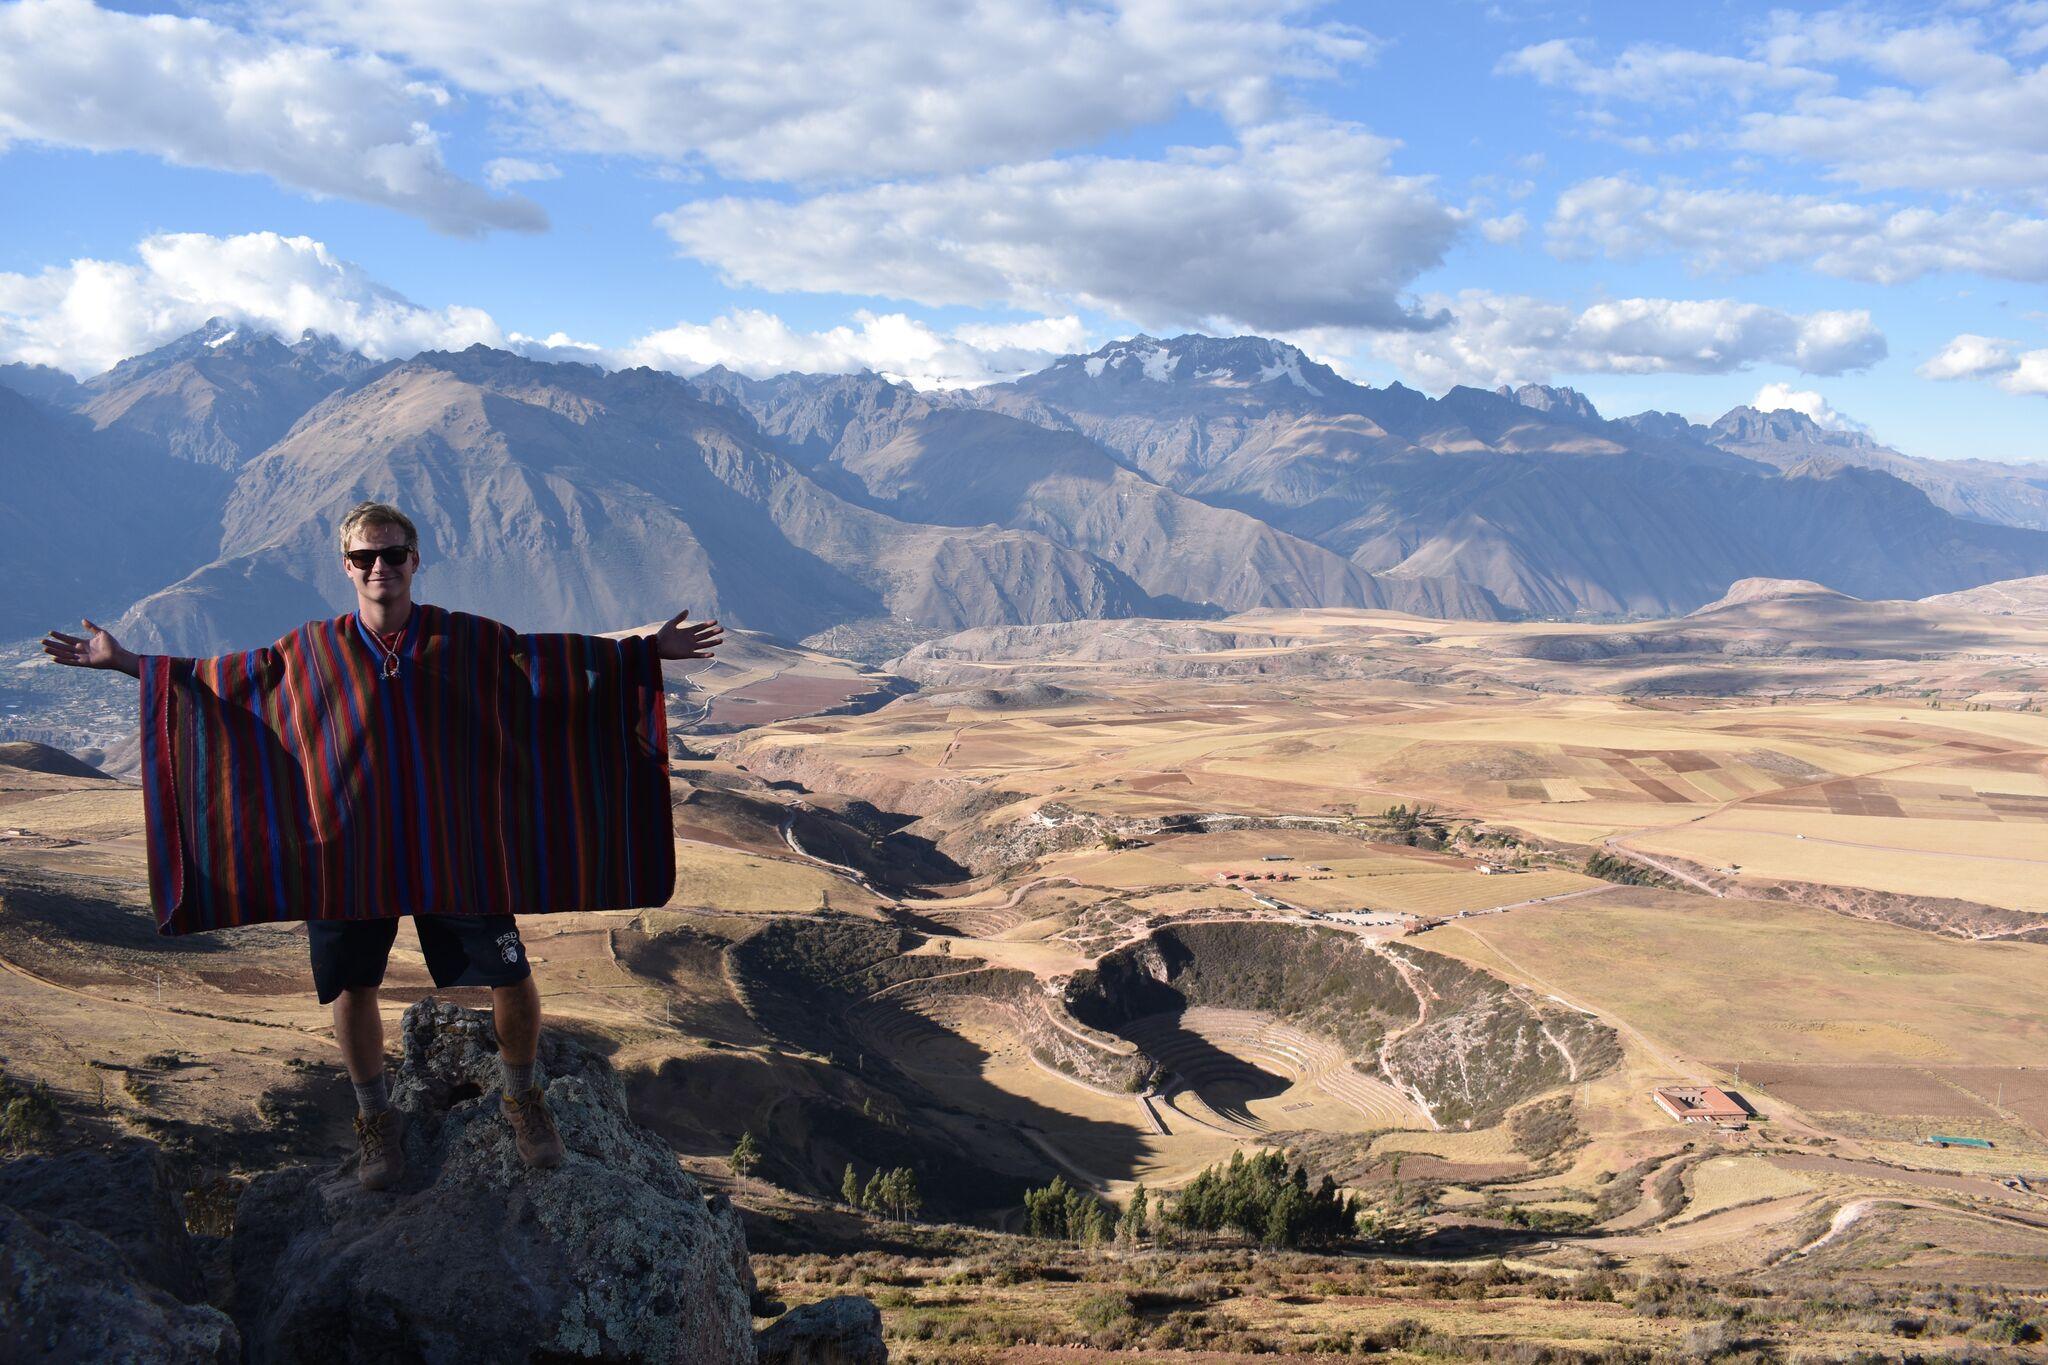 Summer Program - International Relief | Travel For Teens: Peru, Ecuador and the Galápagos Adventure and Service